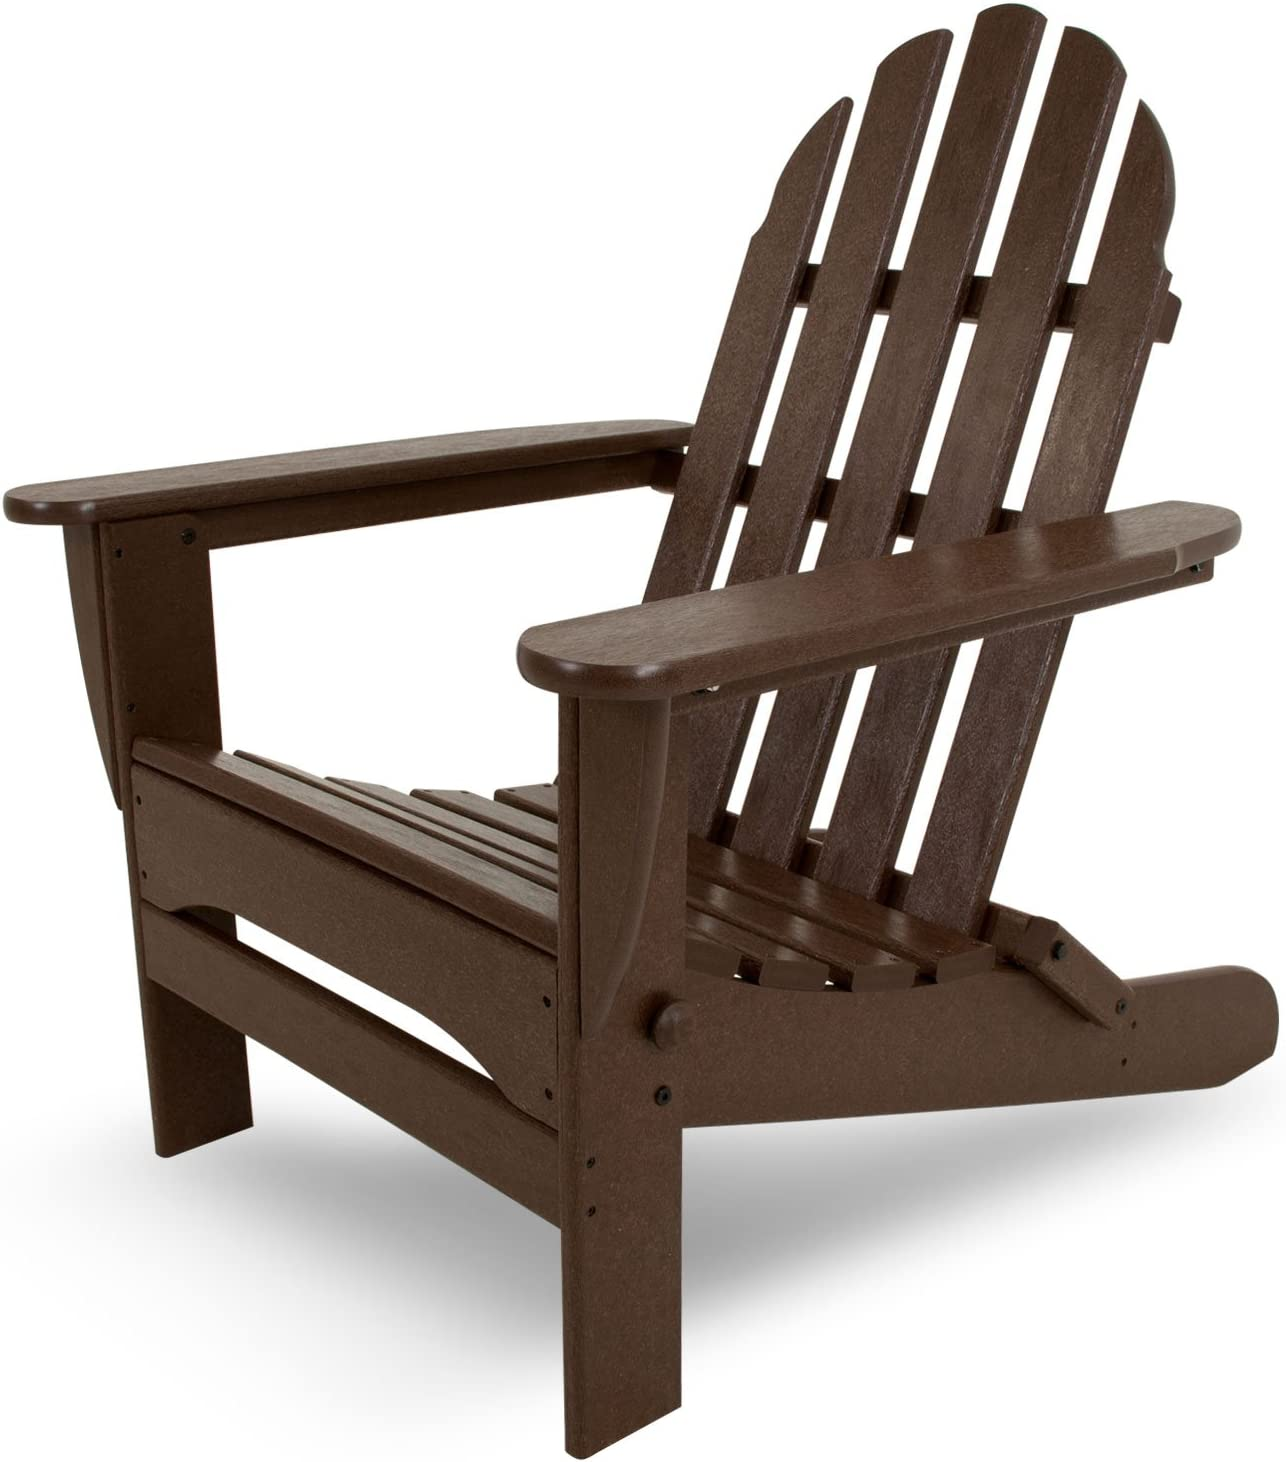 "POLYWOOD AD5030MA Classic Folding Adirondack Chair, 35.00"" x 29"" x 35.00"", Mahogany"